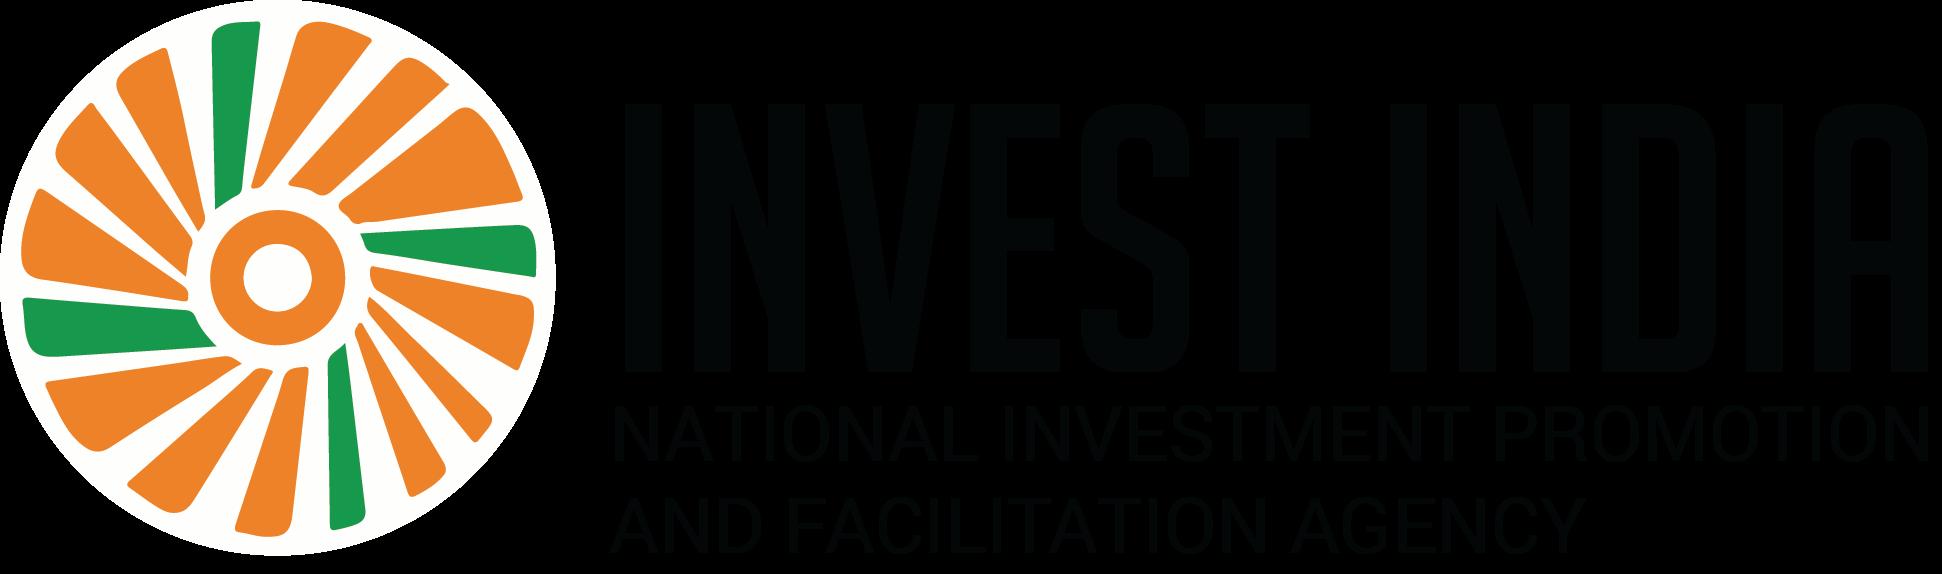 Invest India logo - Partner of InnoHEALTH 2018